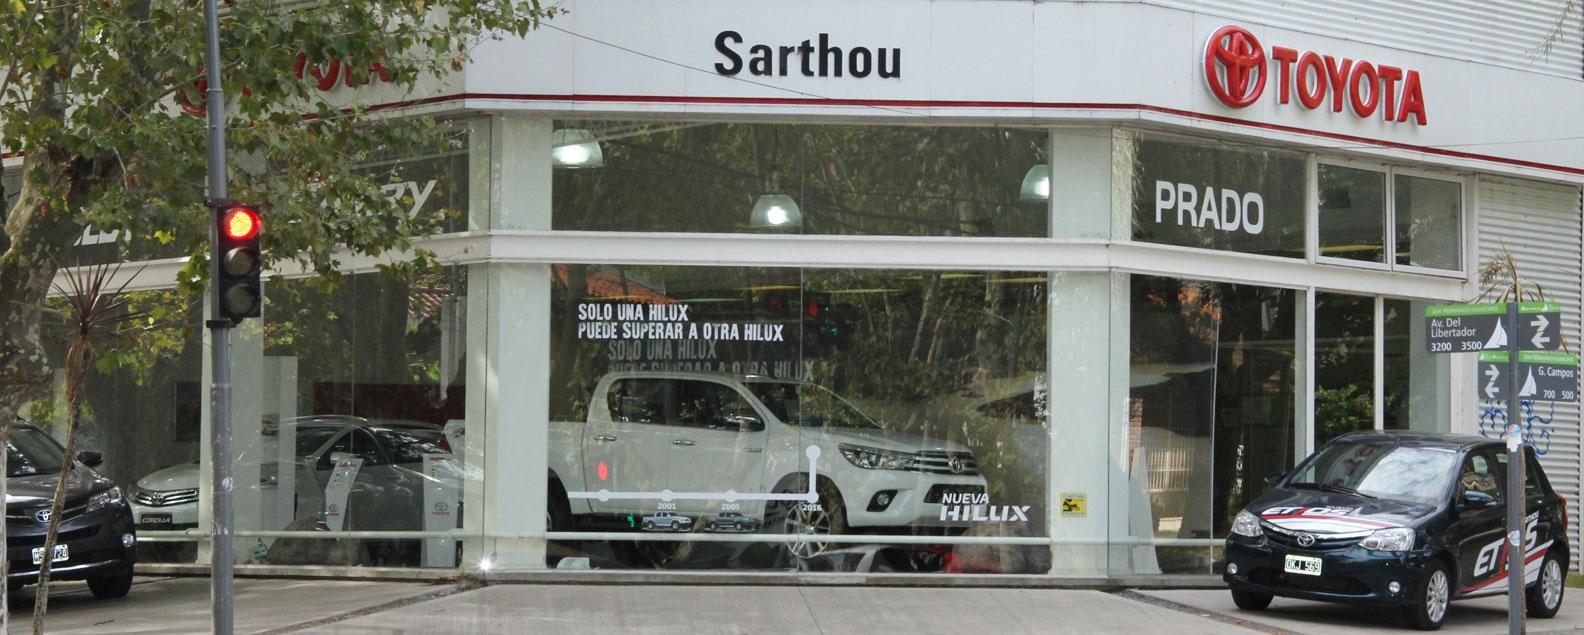 Toyota - Concesionario Sarthou